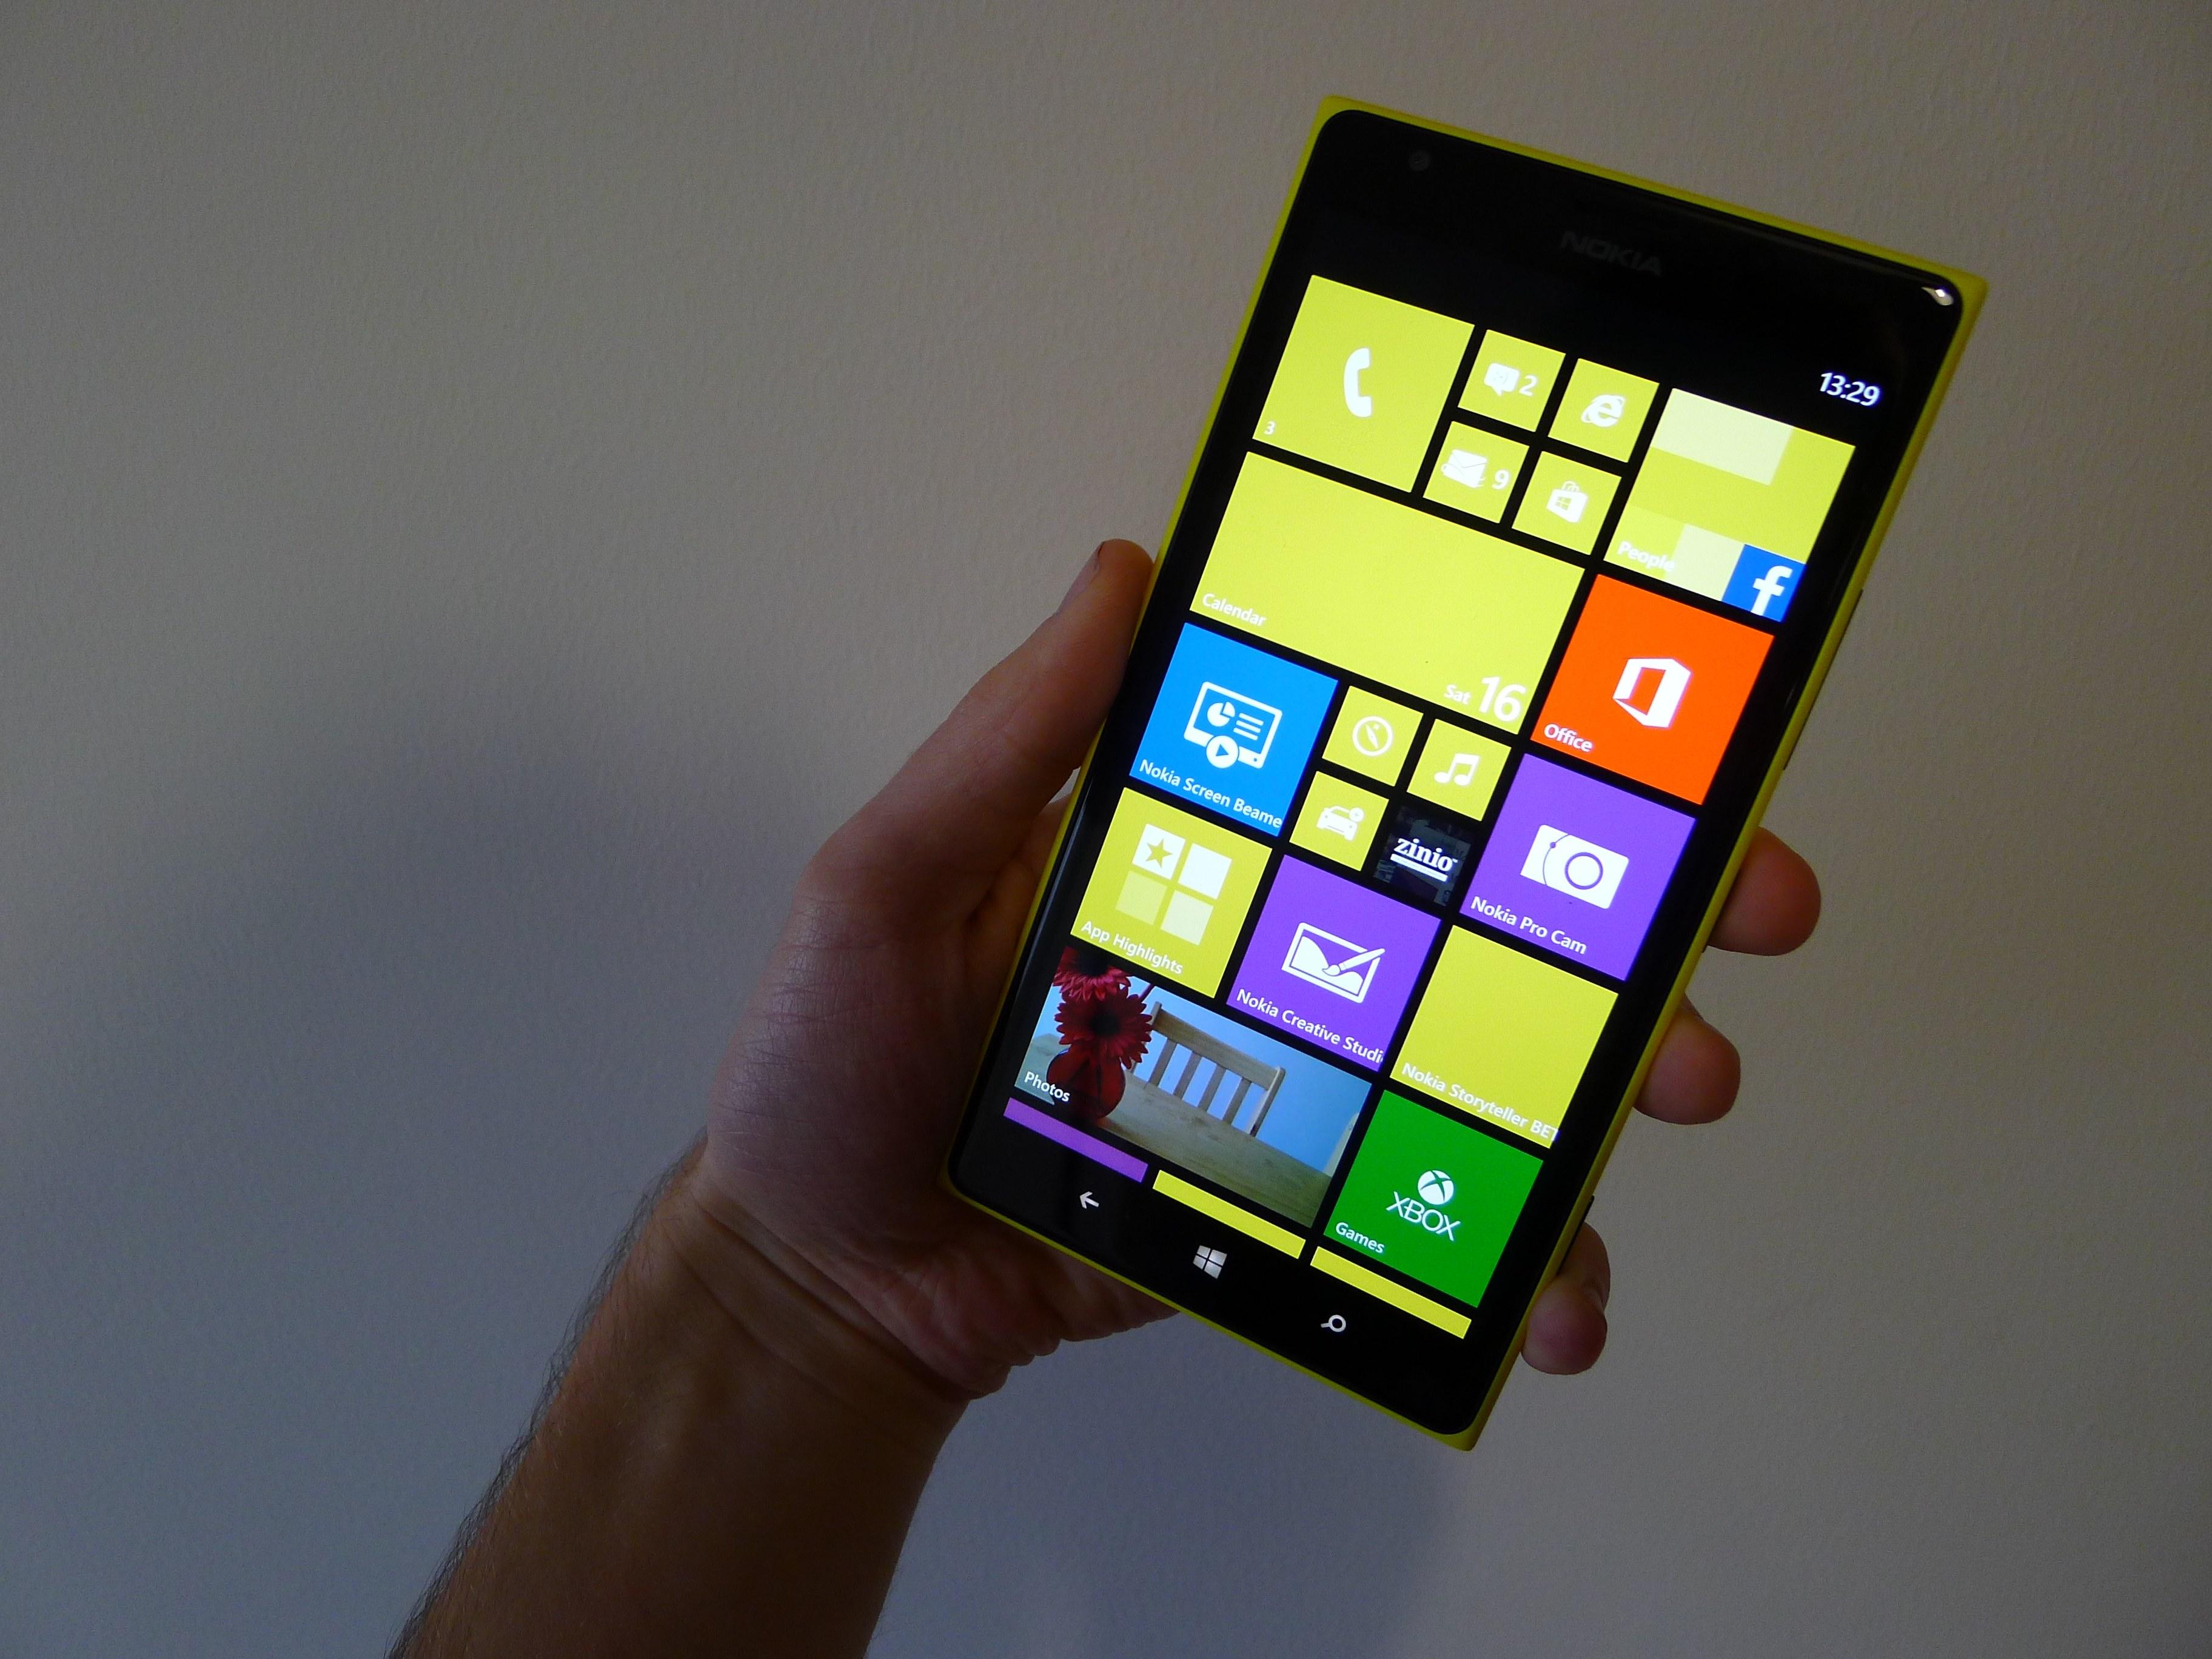 Nokia Lumia 1520 The Best All Round Windows Phone 8 Experience